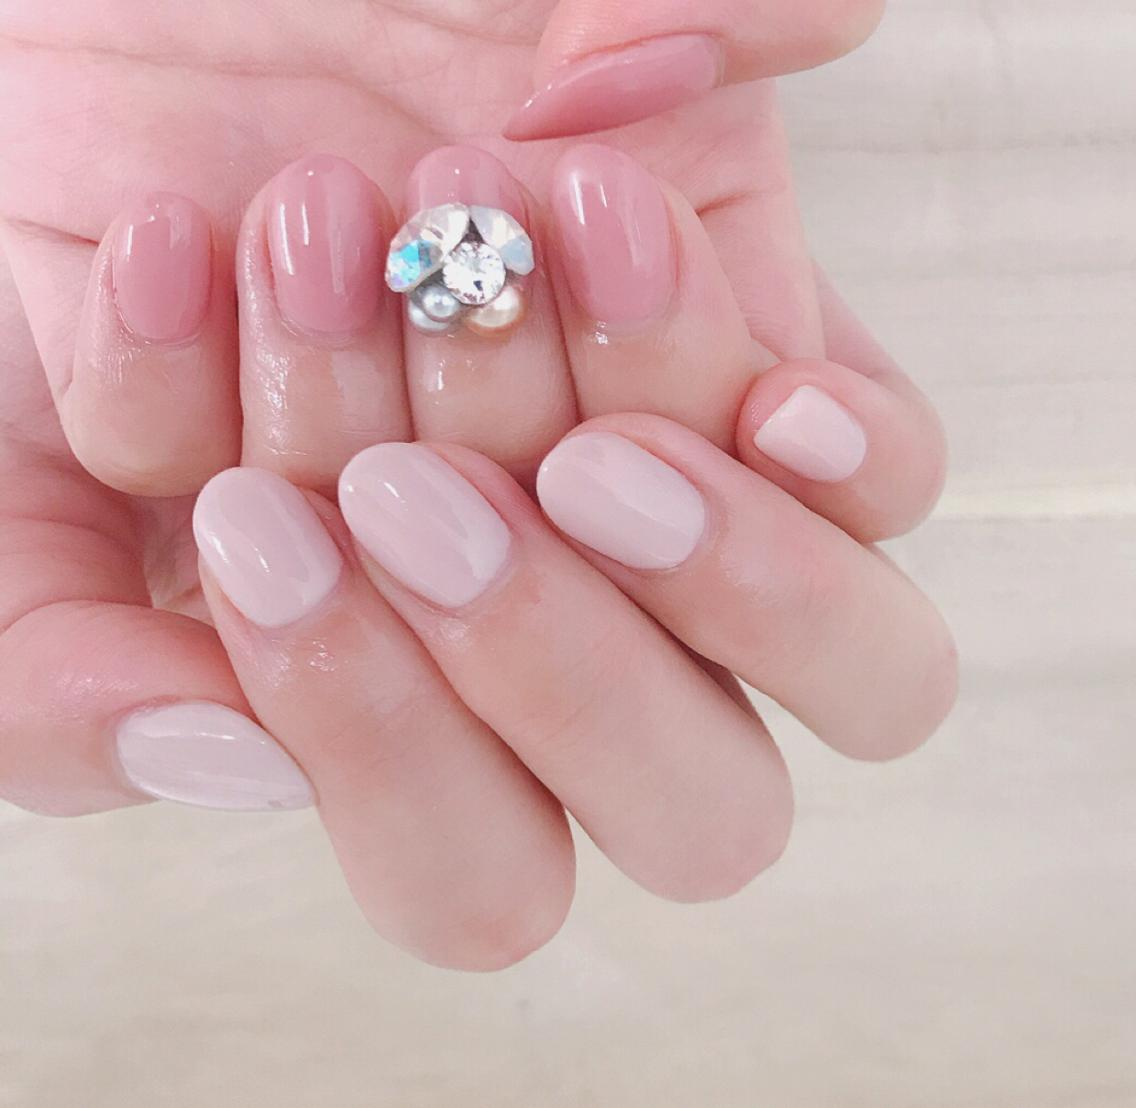 eye&nail  anello所属・nail.anelloの掲載